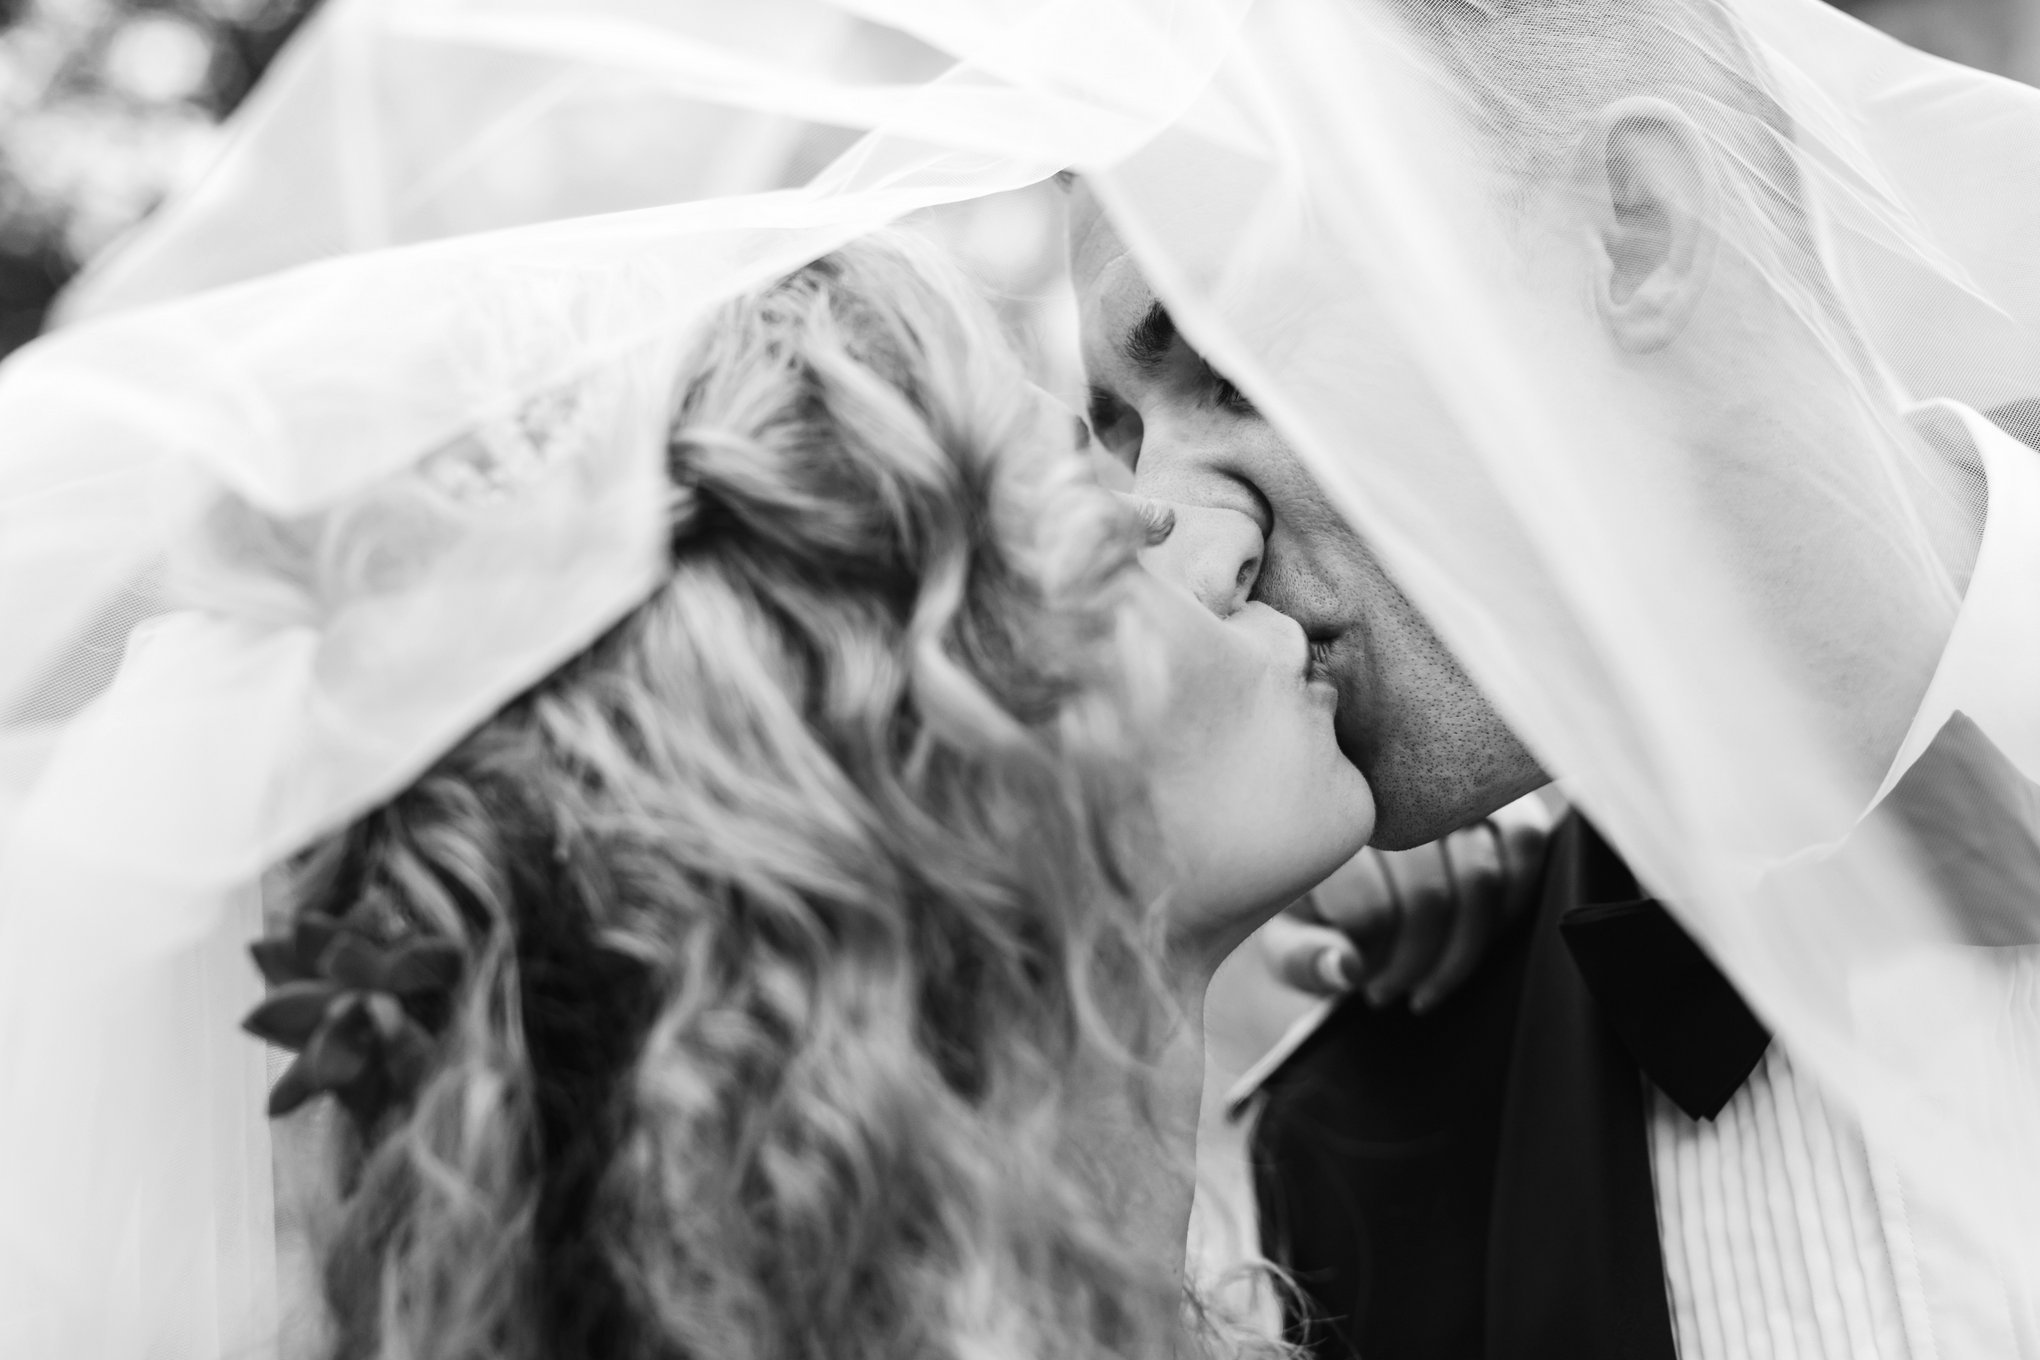 Lena_Mirisola_2017_Weddings_-025.jpg